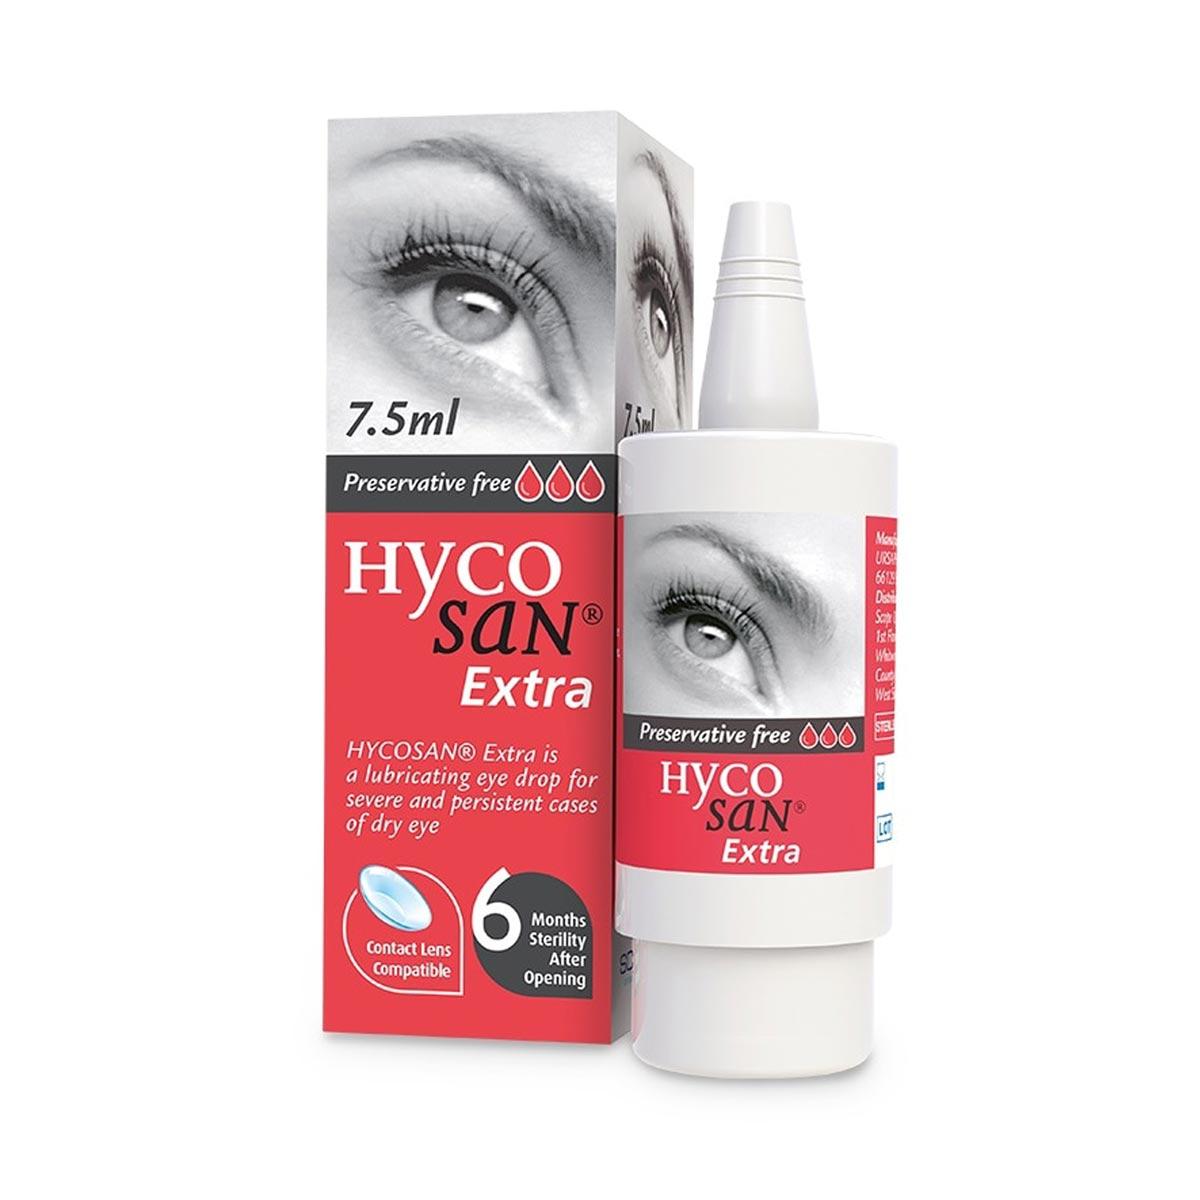 Lenstore Hycosan Extra Eye Drops (7.5ml)